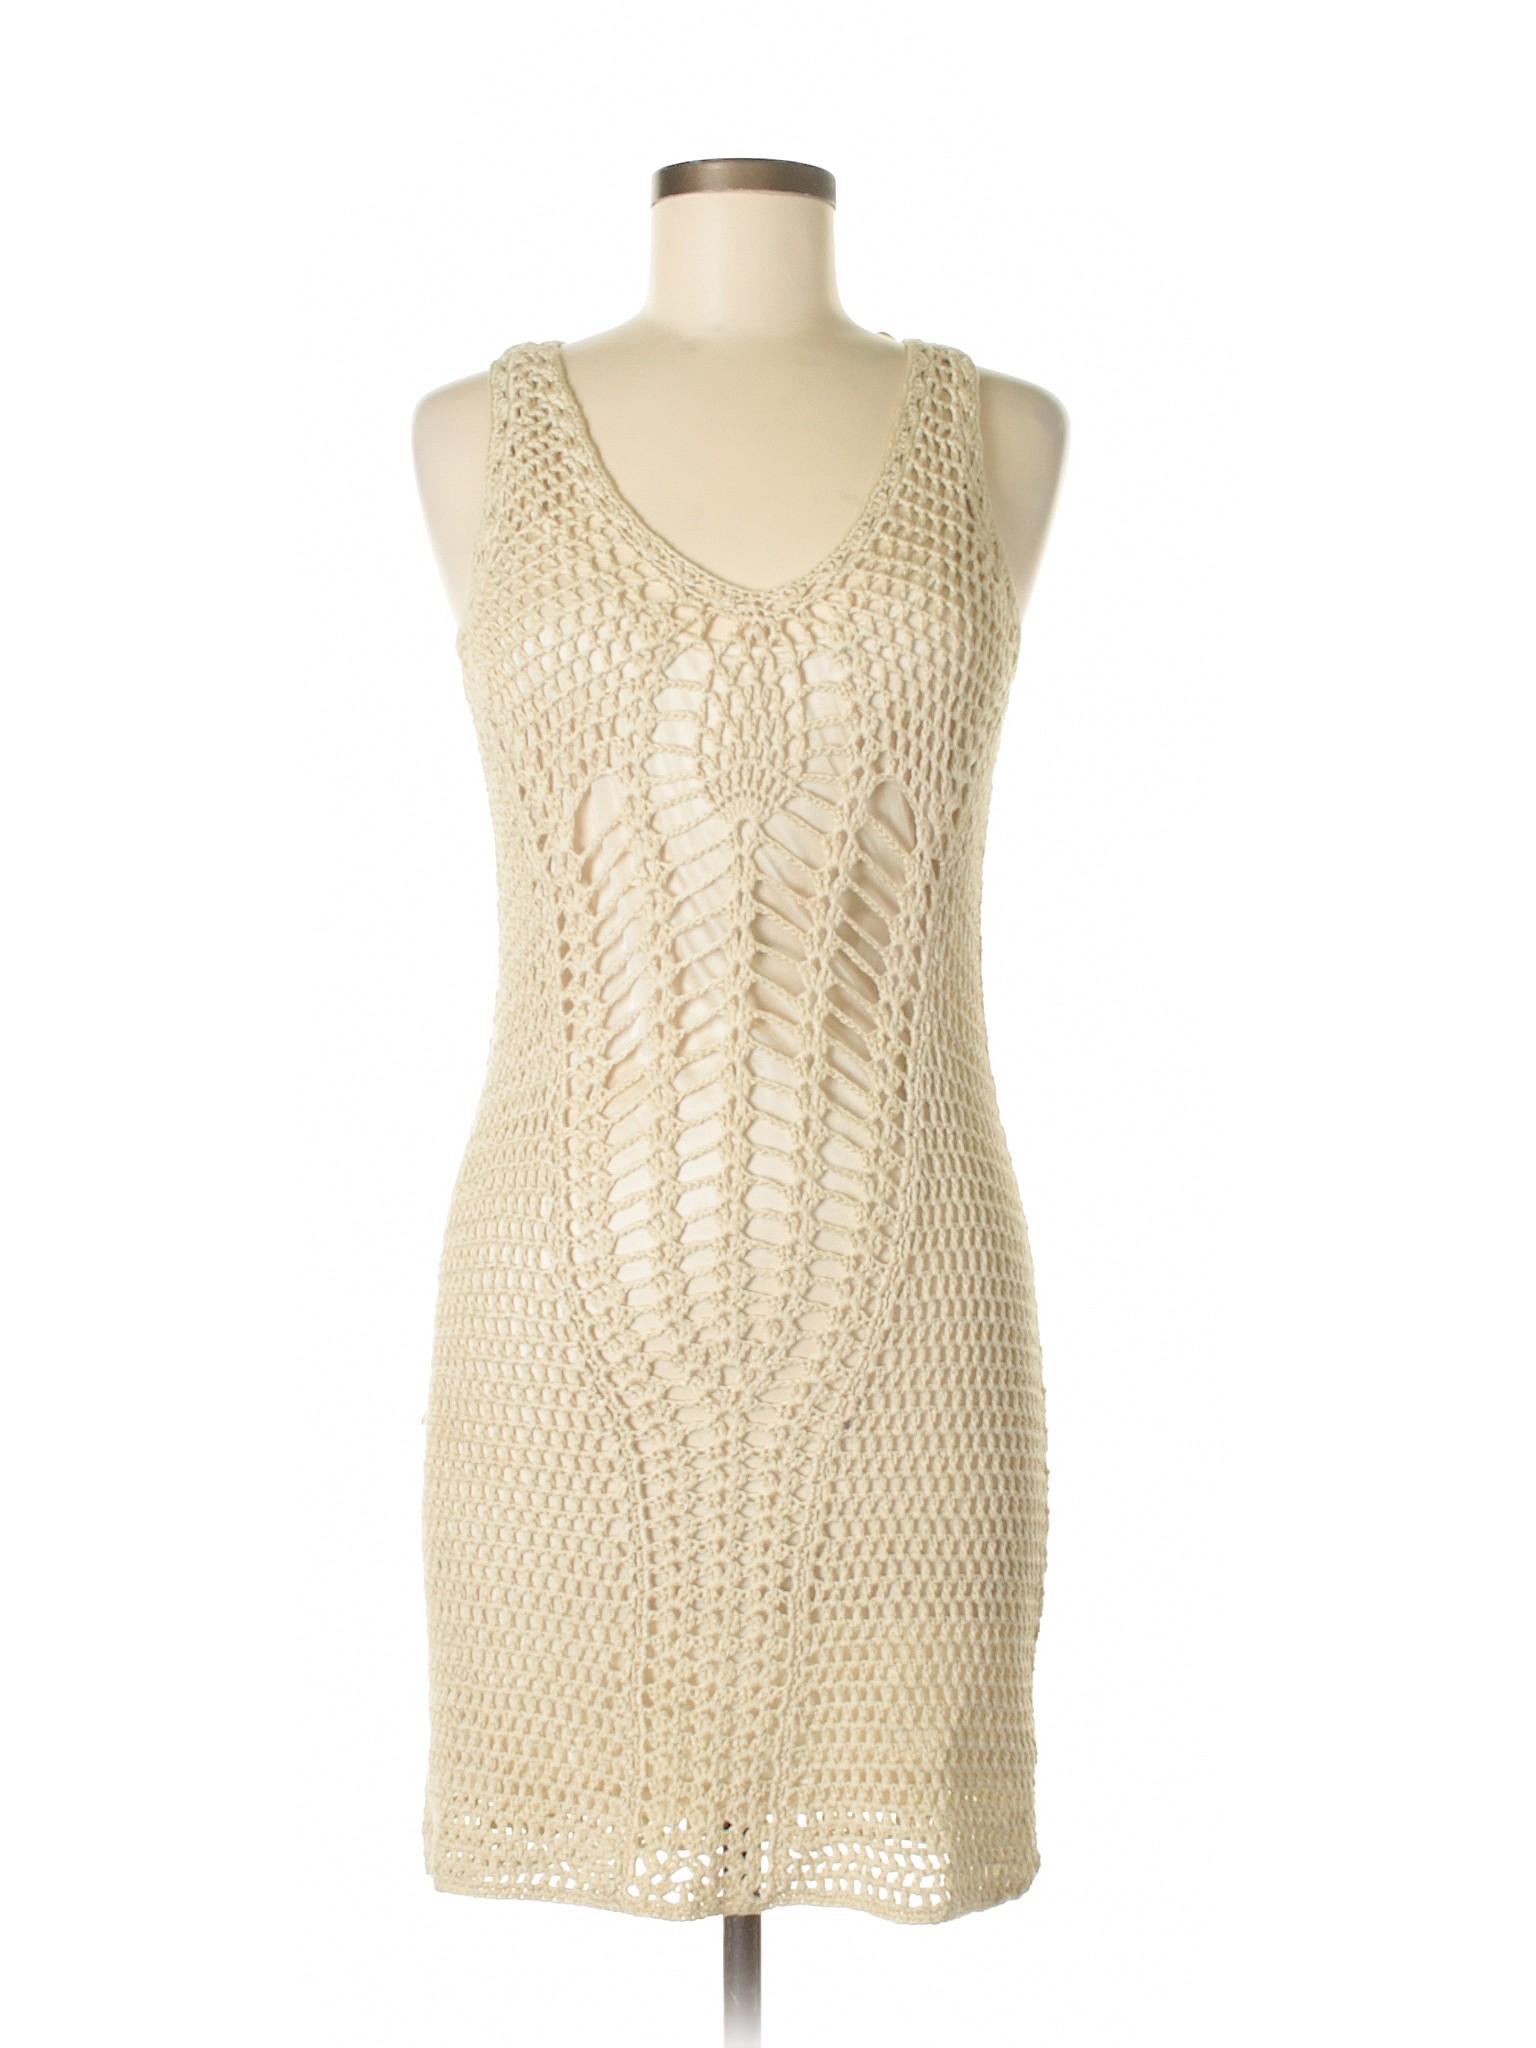 Boutique Dress Casual Casual winter Boutique Zara winter Dress Boutique Zara winter Bgwq4B1